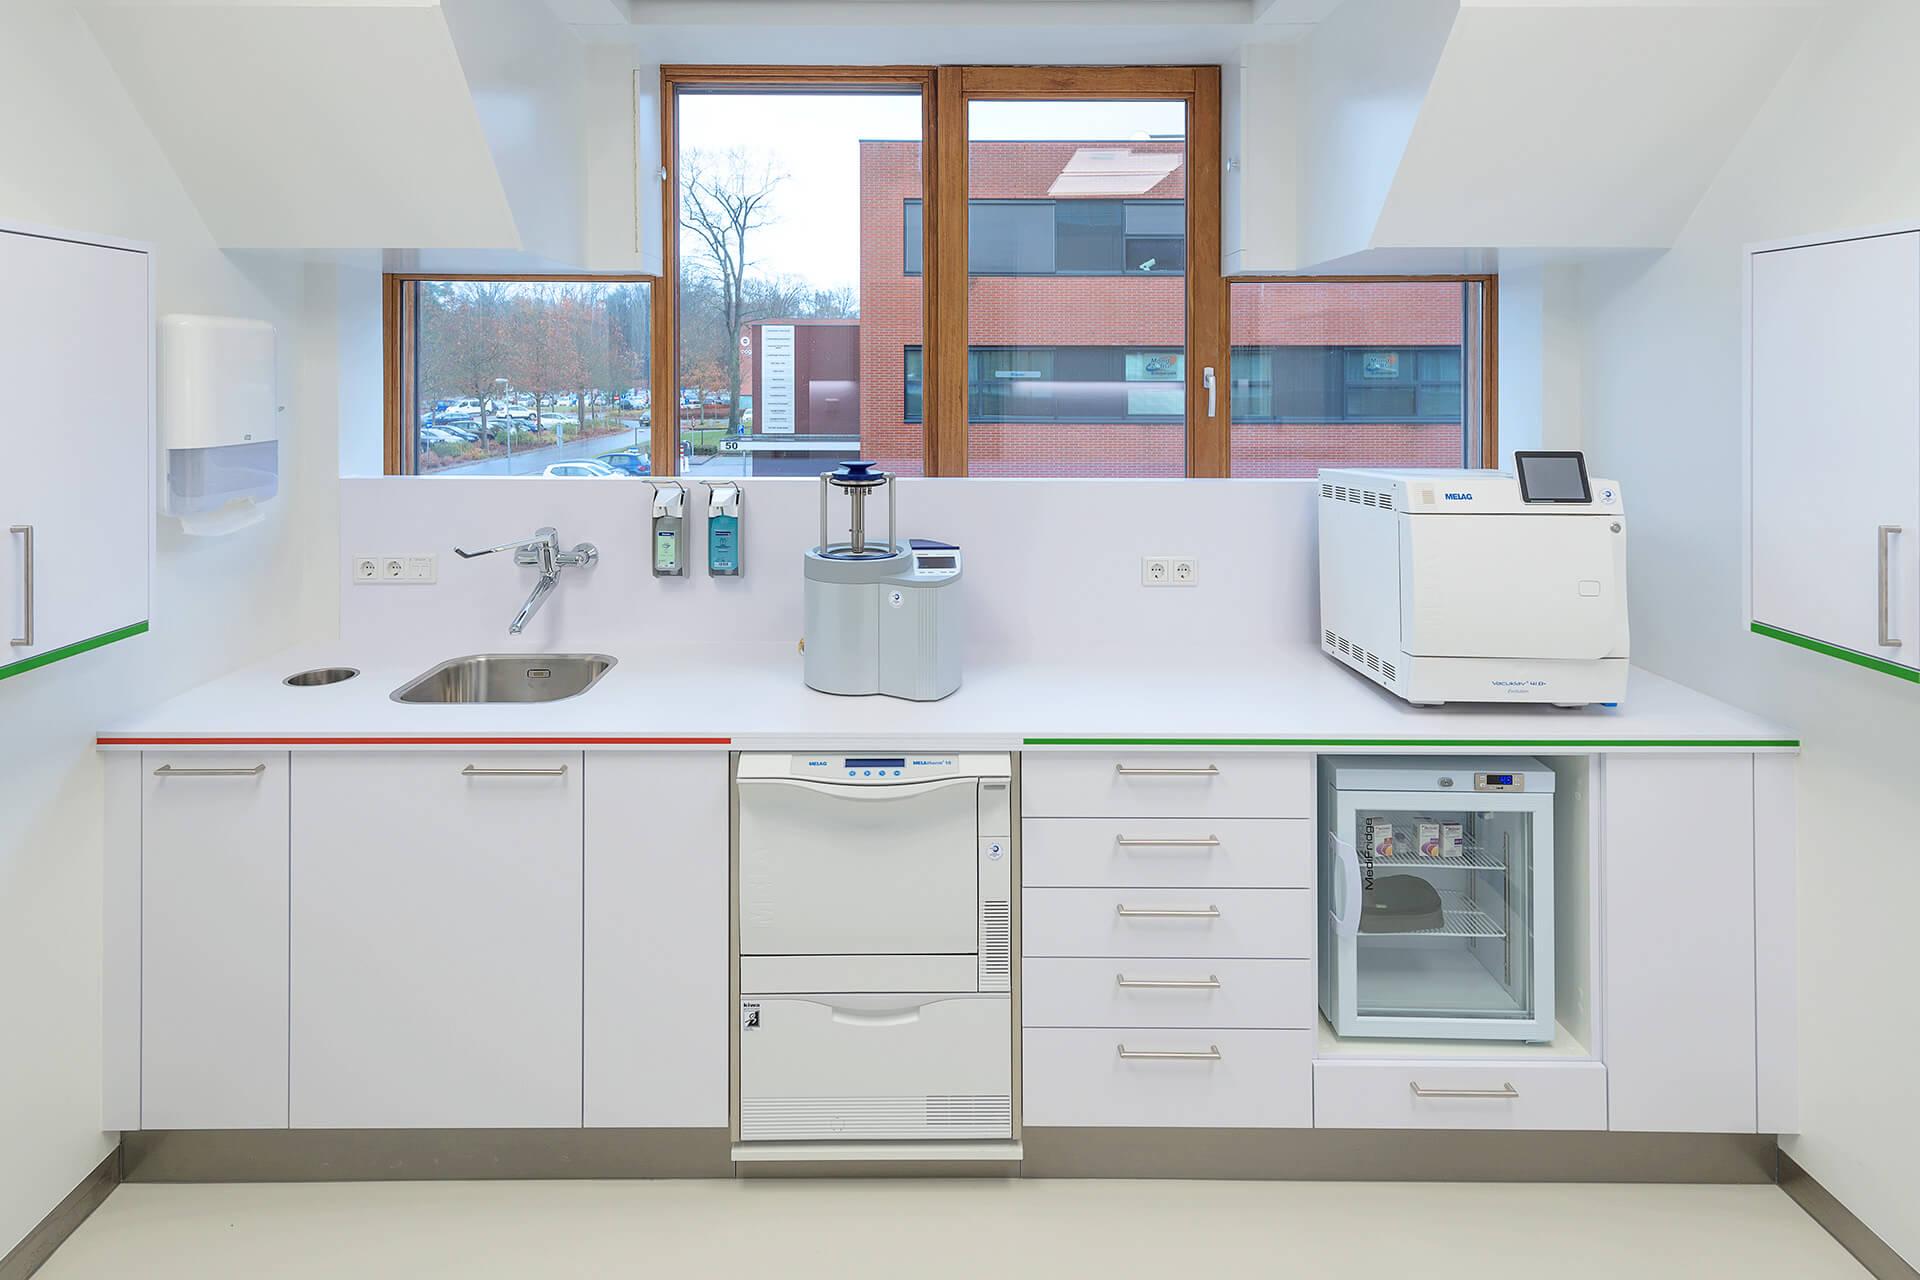 sterilisatieruimte1